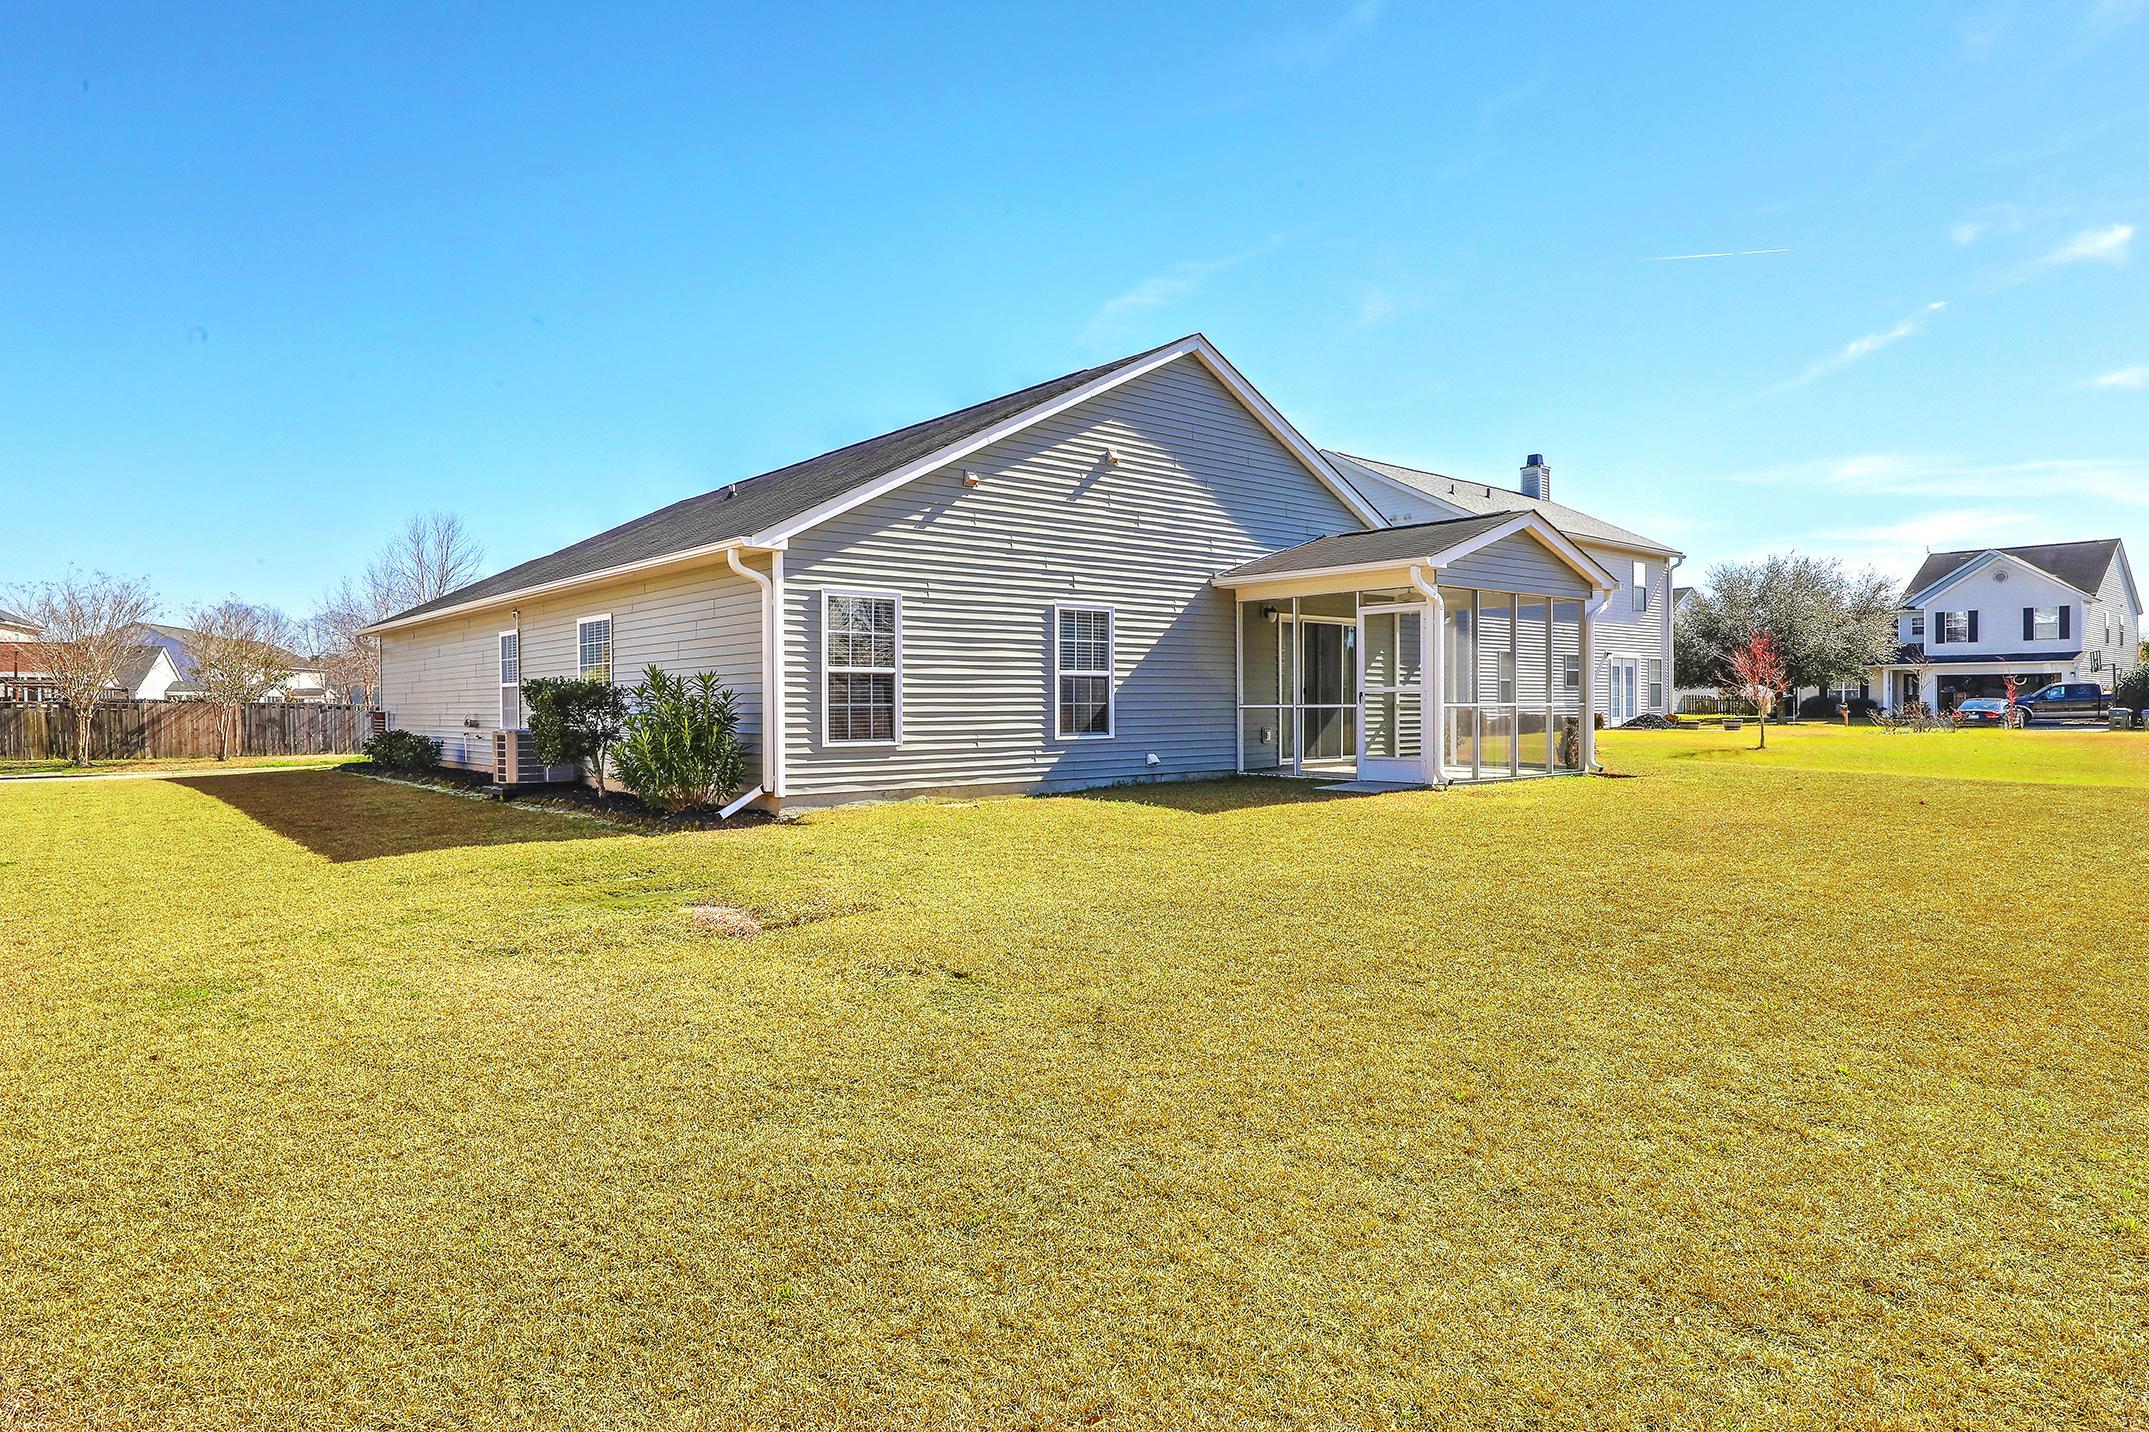 103 Waylon Drive Summerville, SC 29483